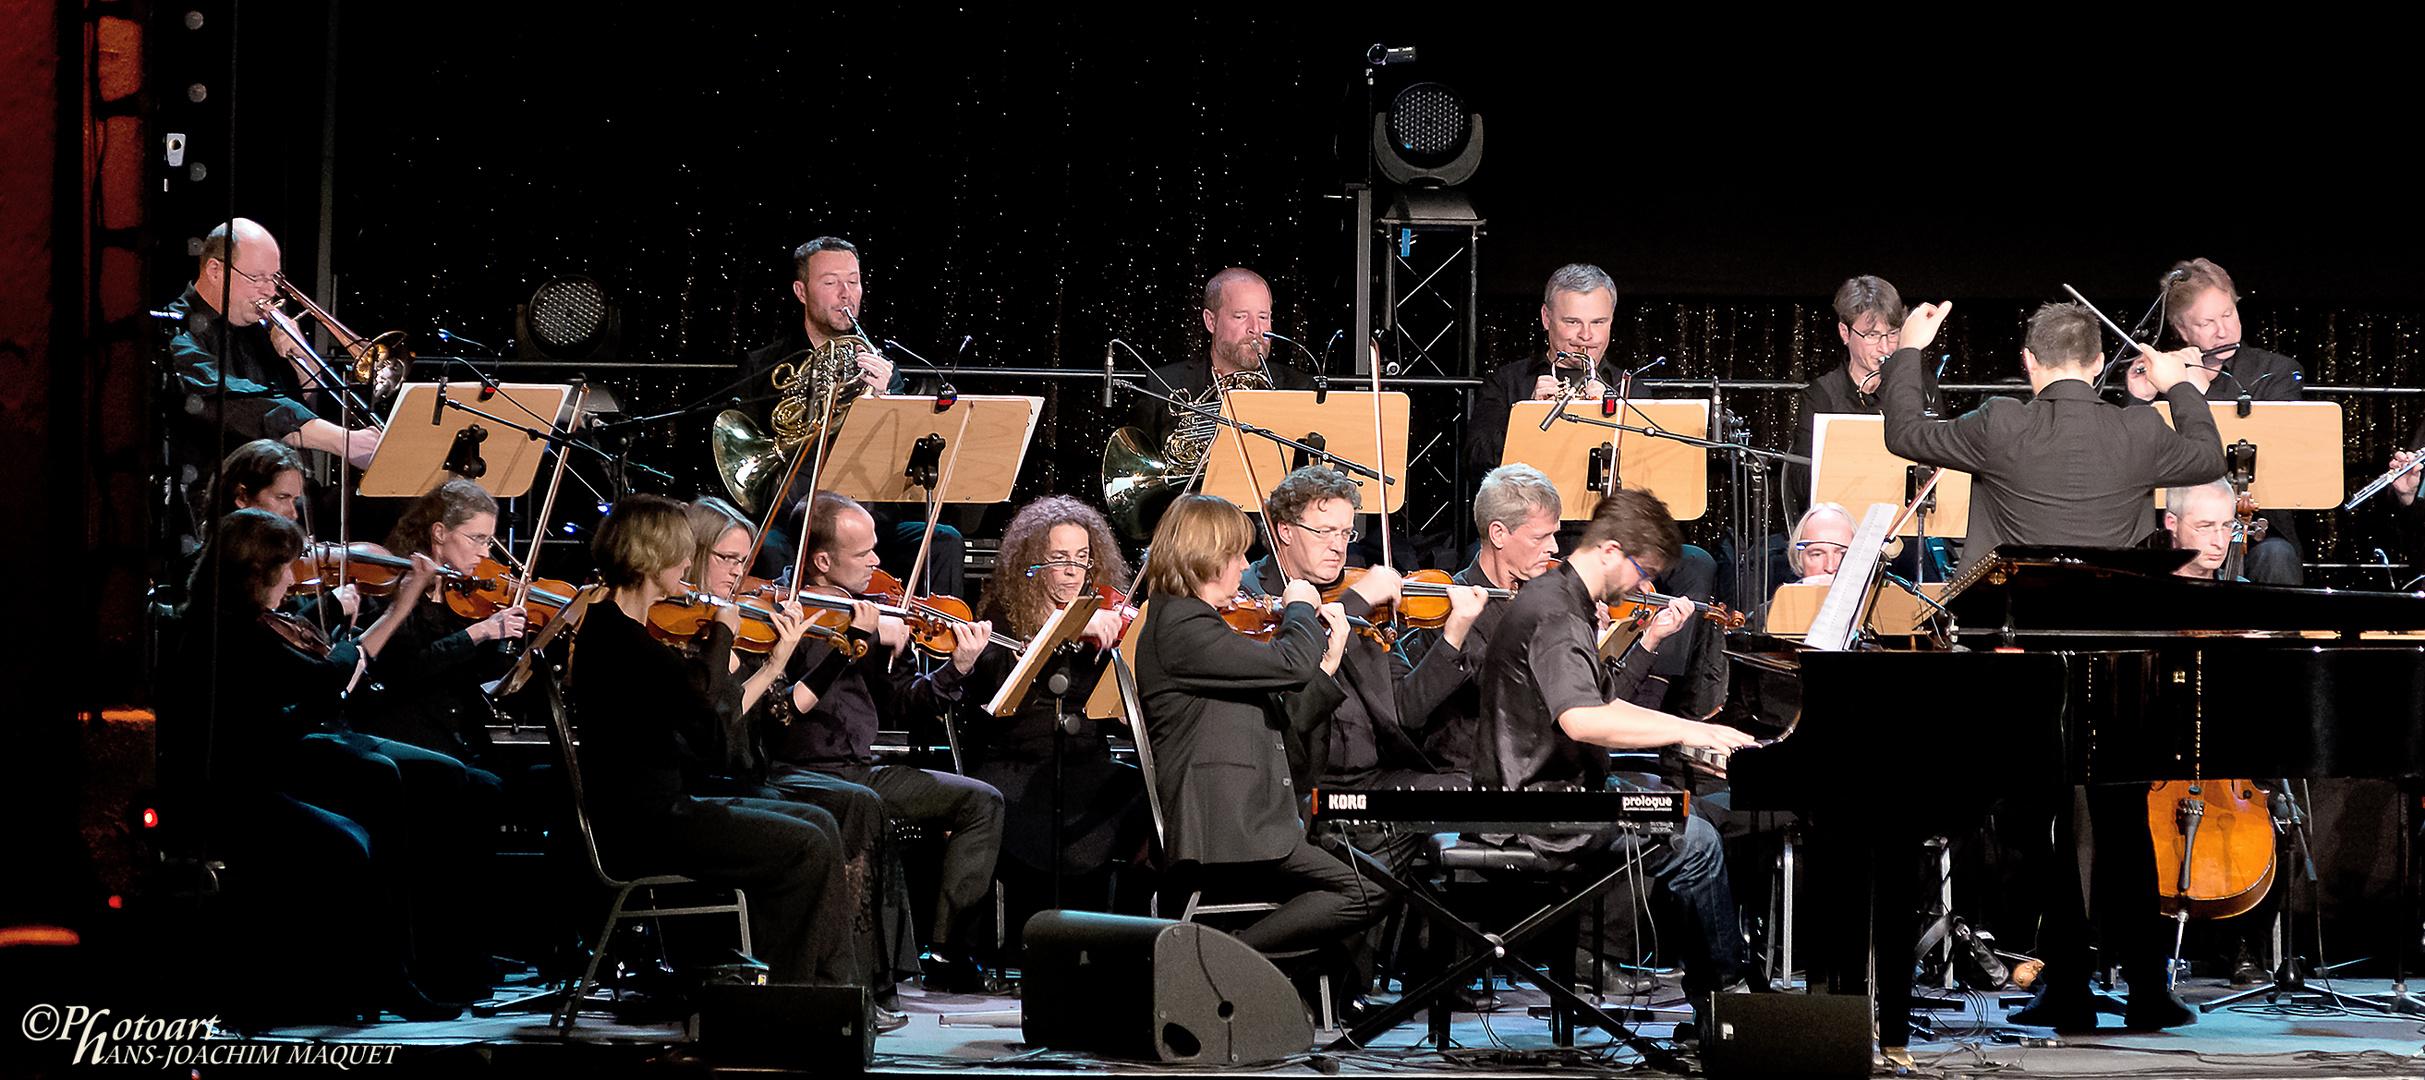 Dresdner Sinfoniker - Jubiläumskonzert 20 Jahre